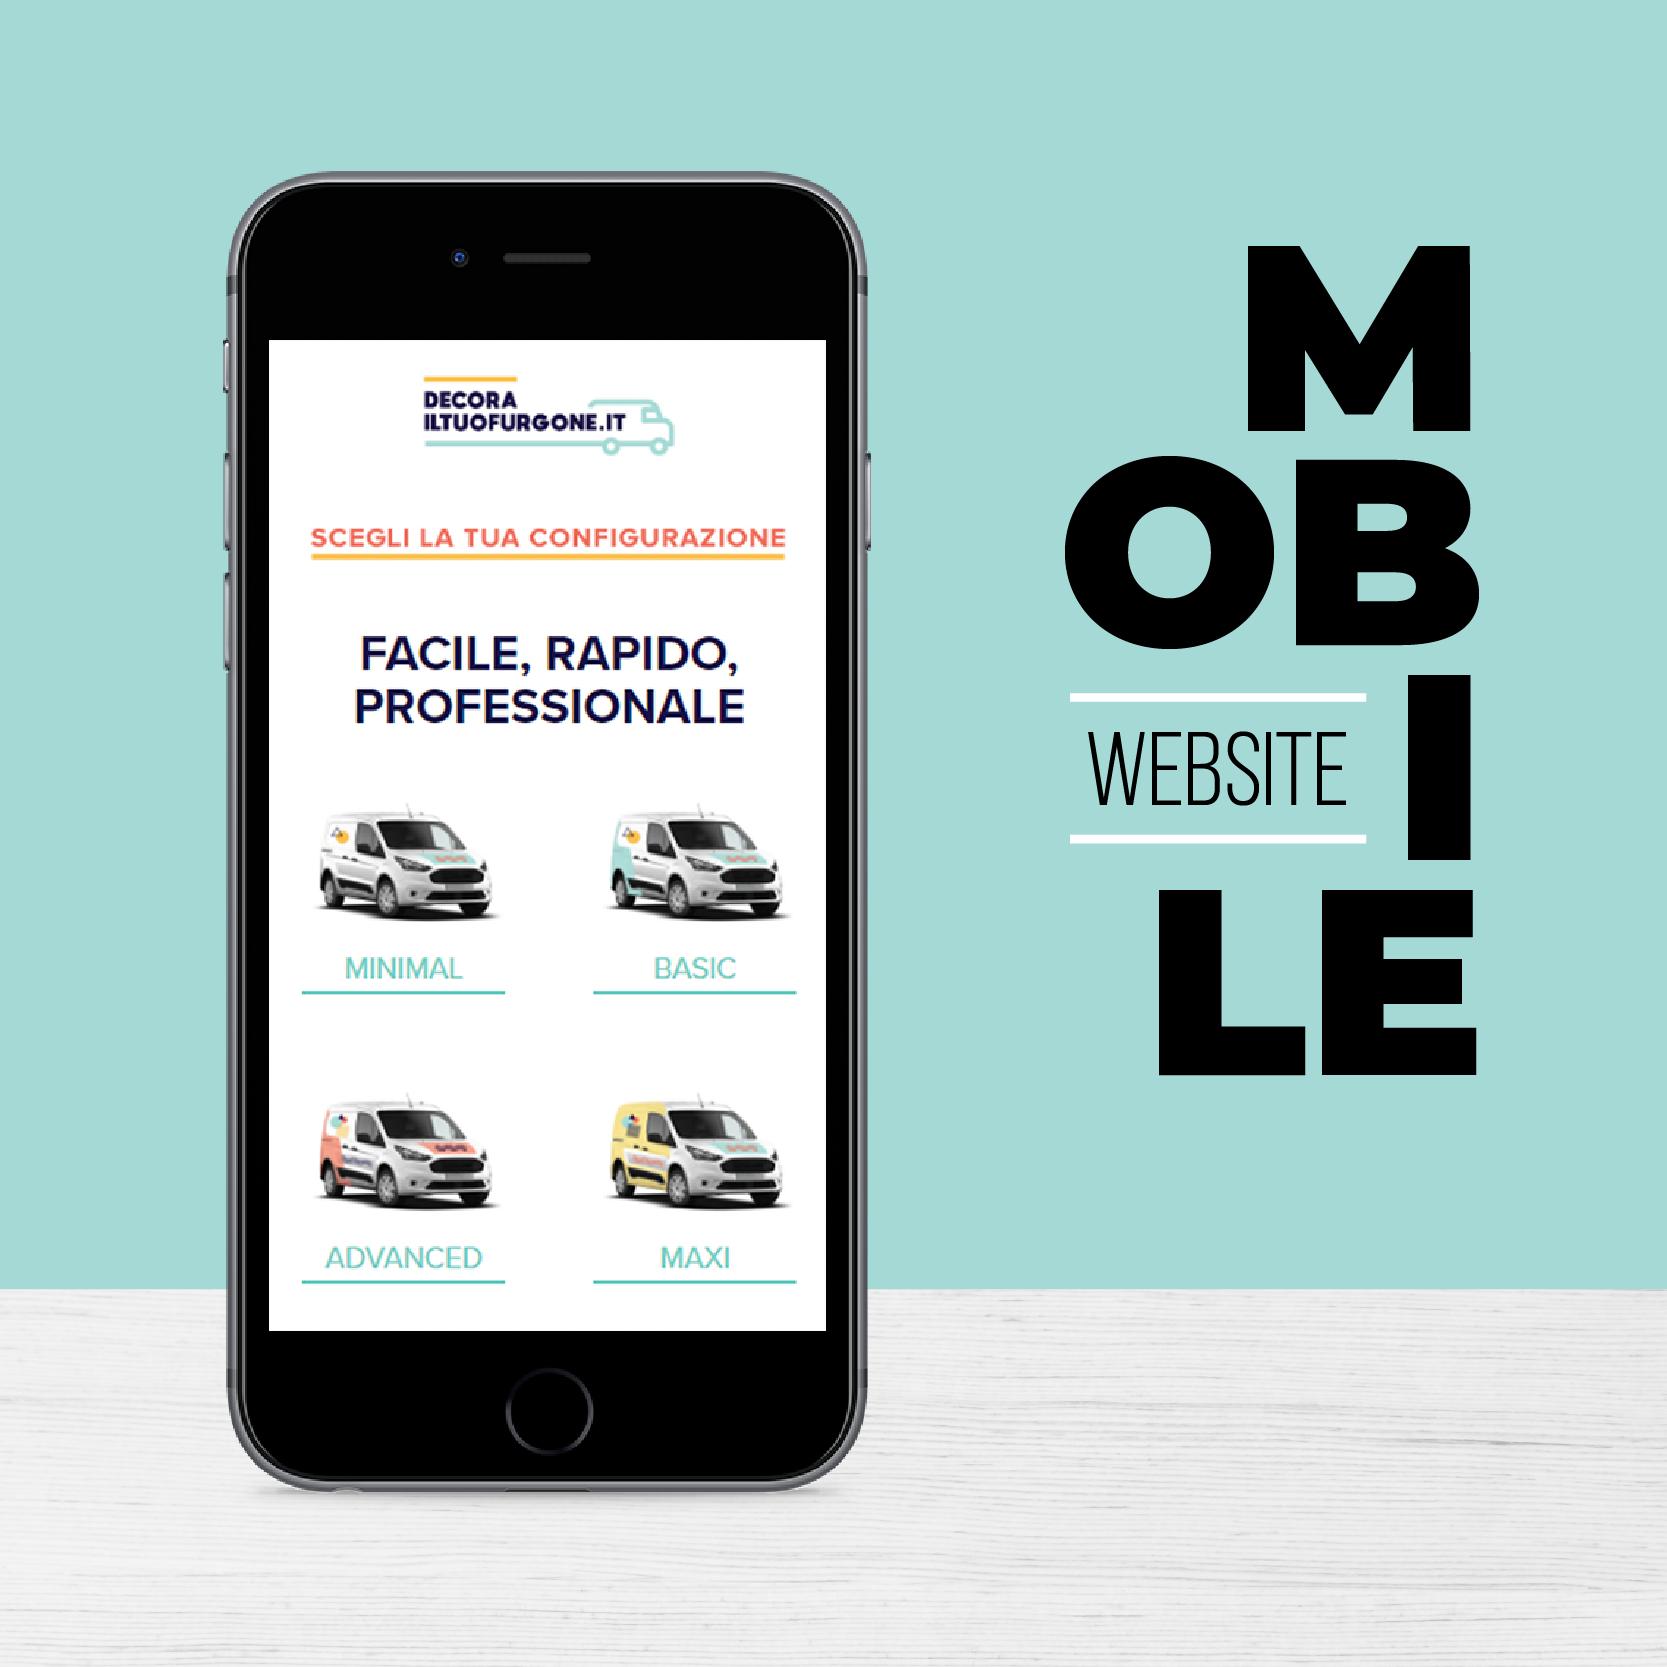 creazione siti internet bra cuneo siti mobile da cellulare siti professionali prezzi .jpg